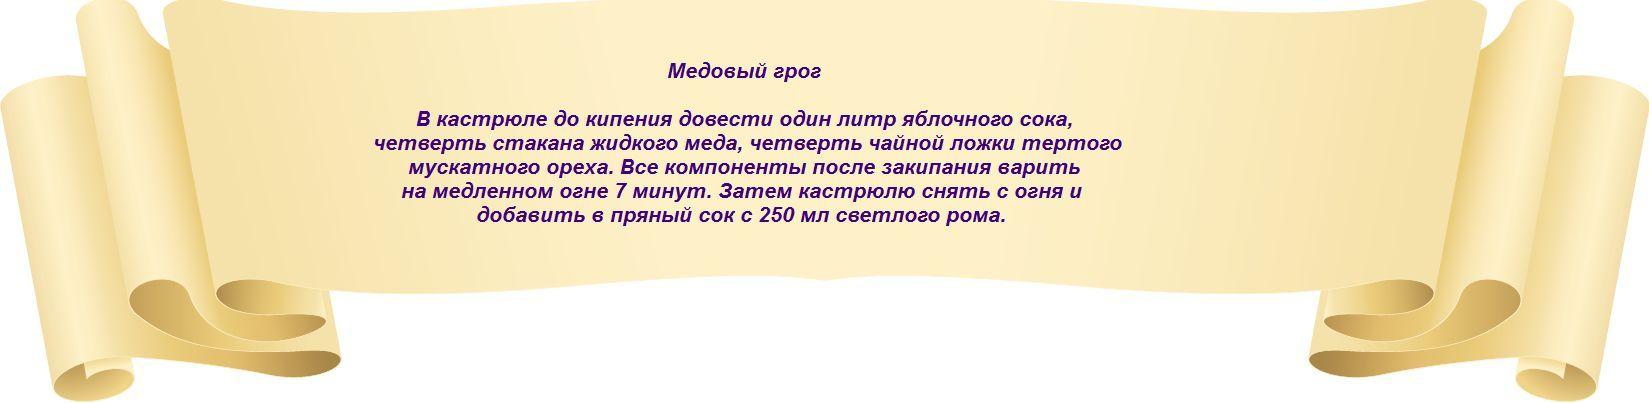 глинтвейн и грог рецепт: